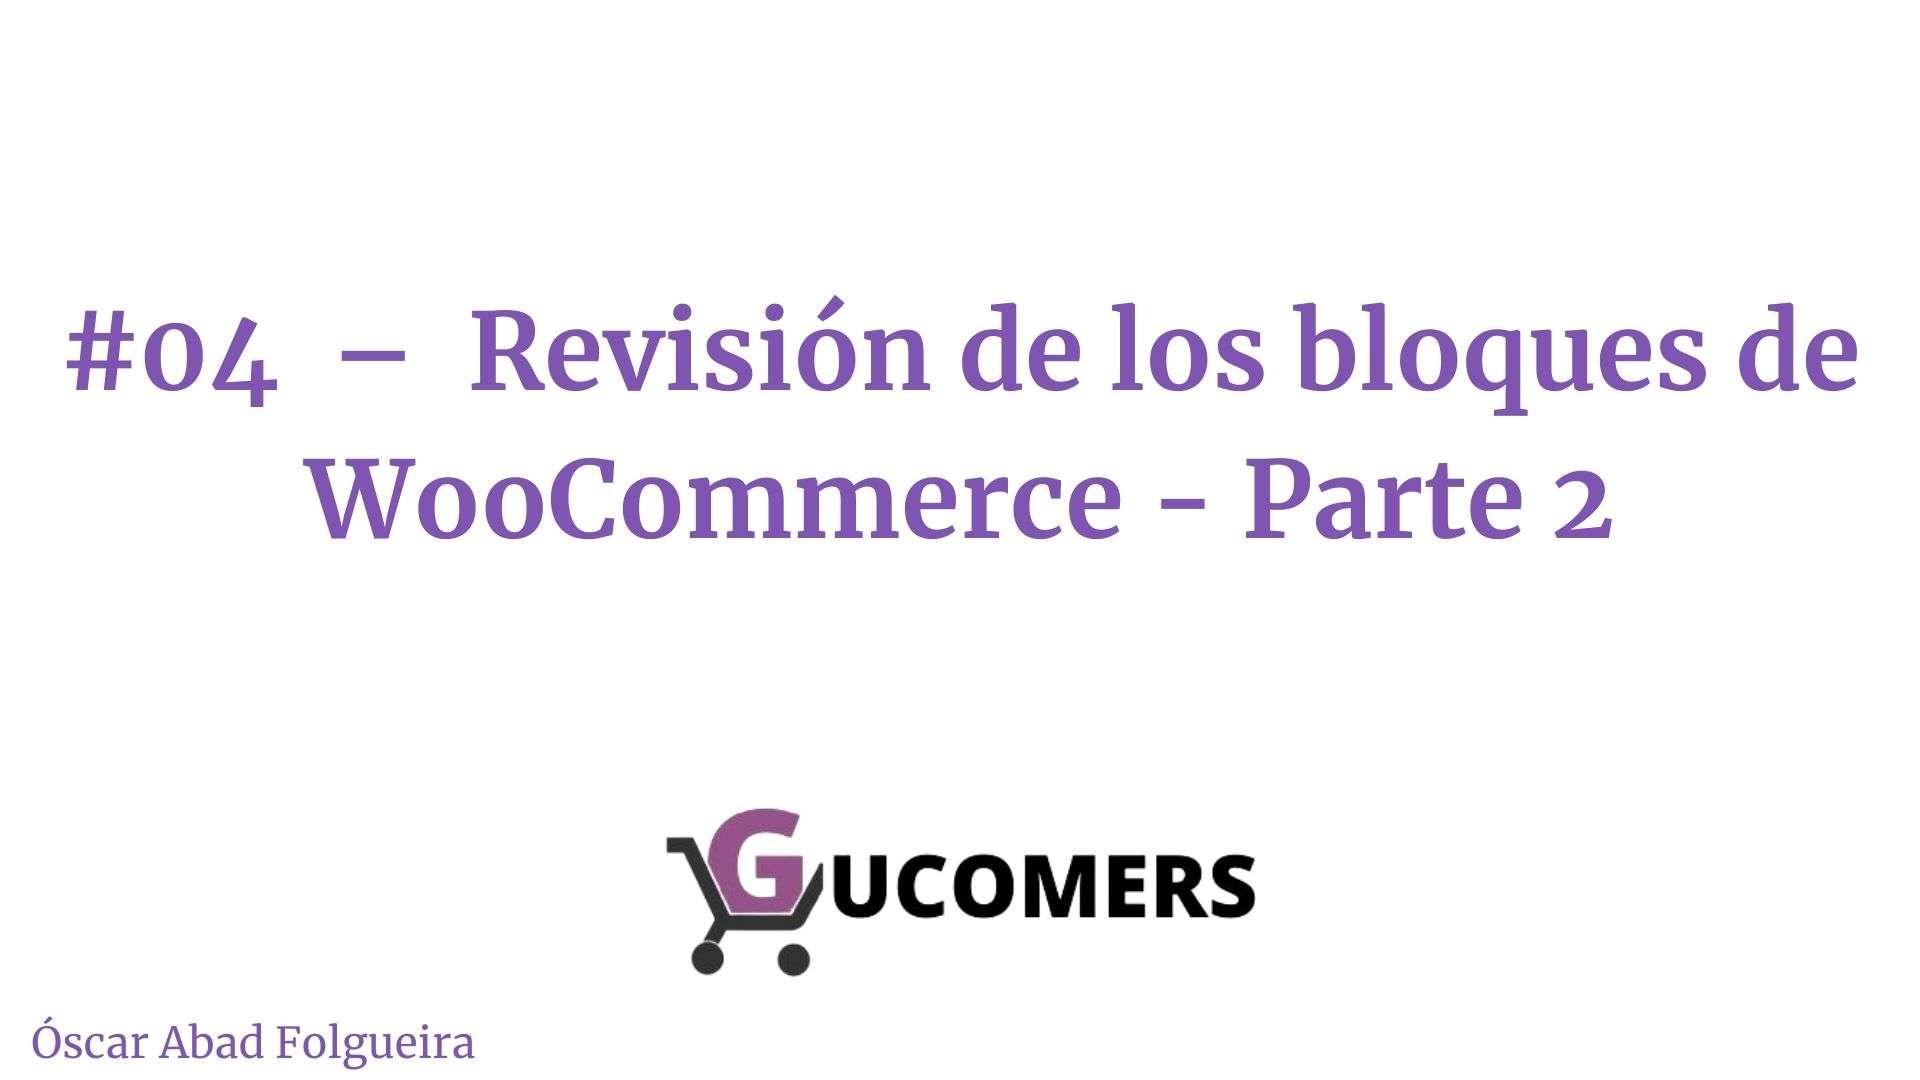 gucomers-04–revision de los bloques de WooCommerce - Parte 2